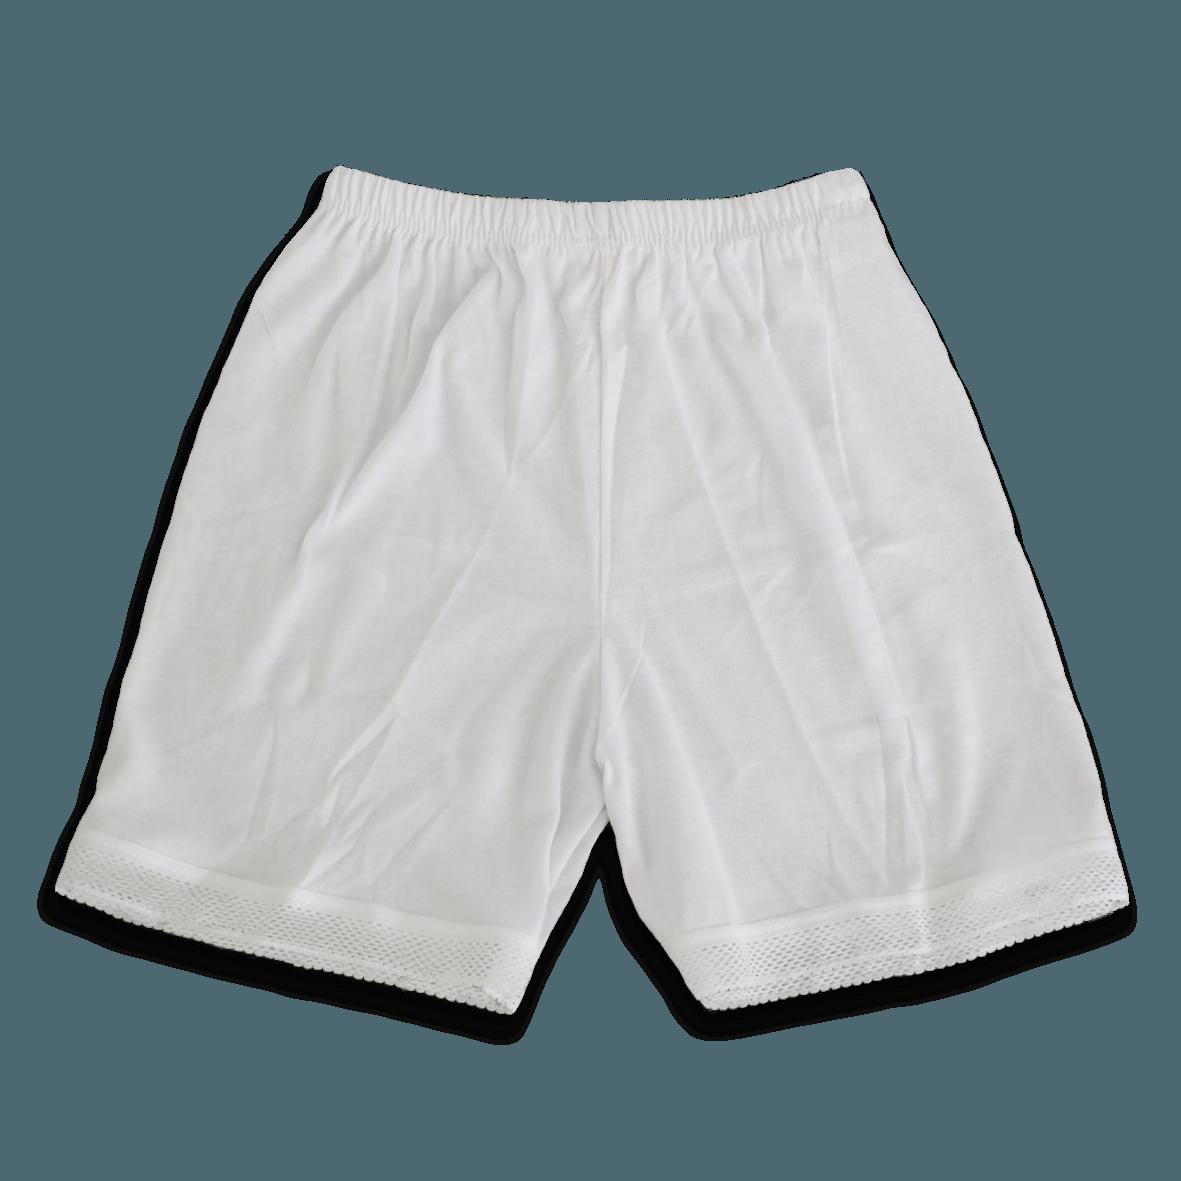 Velona Ladies Shorts